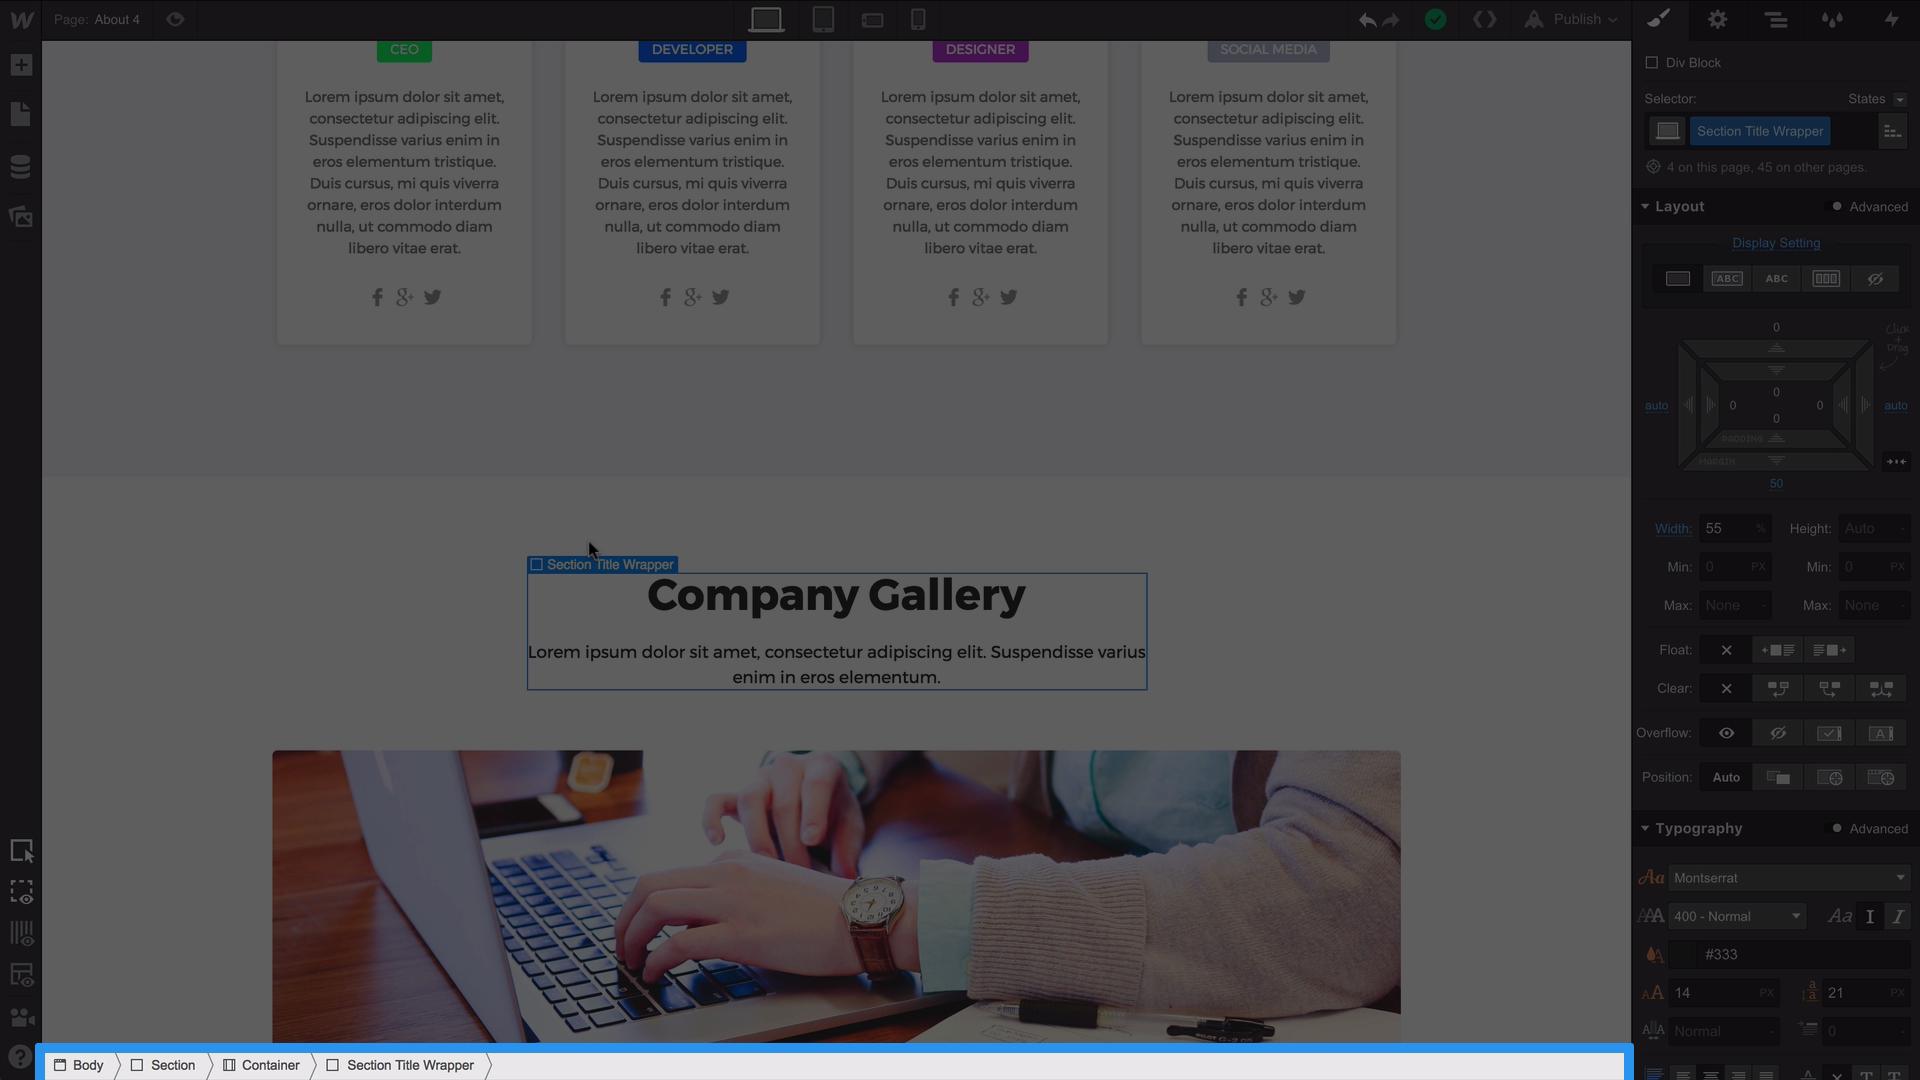 The Webflow breadcrumb navigation bar